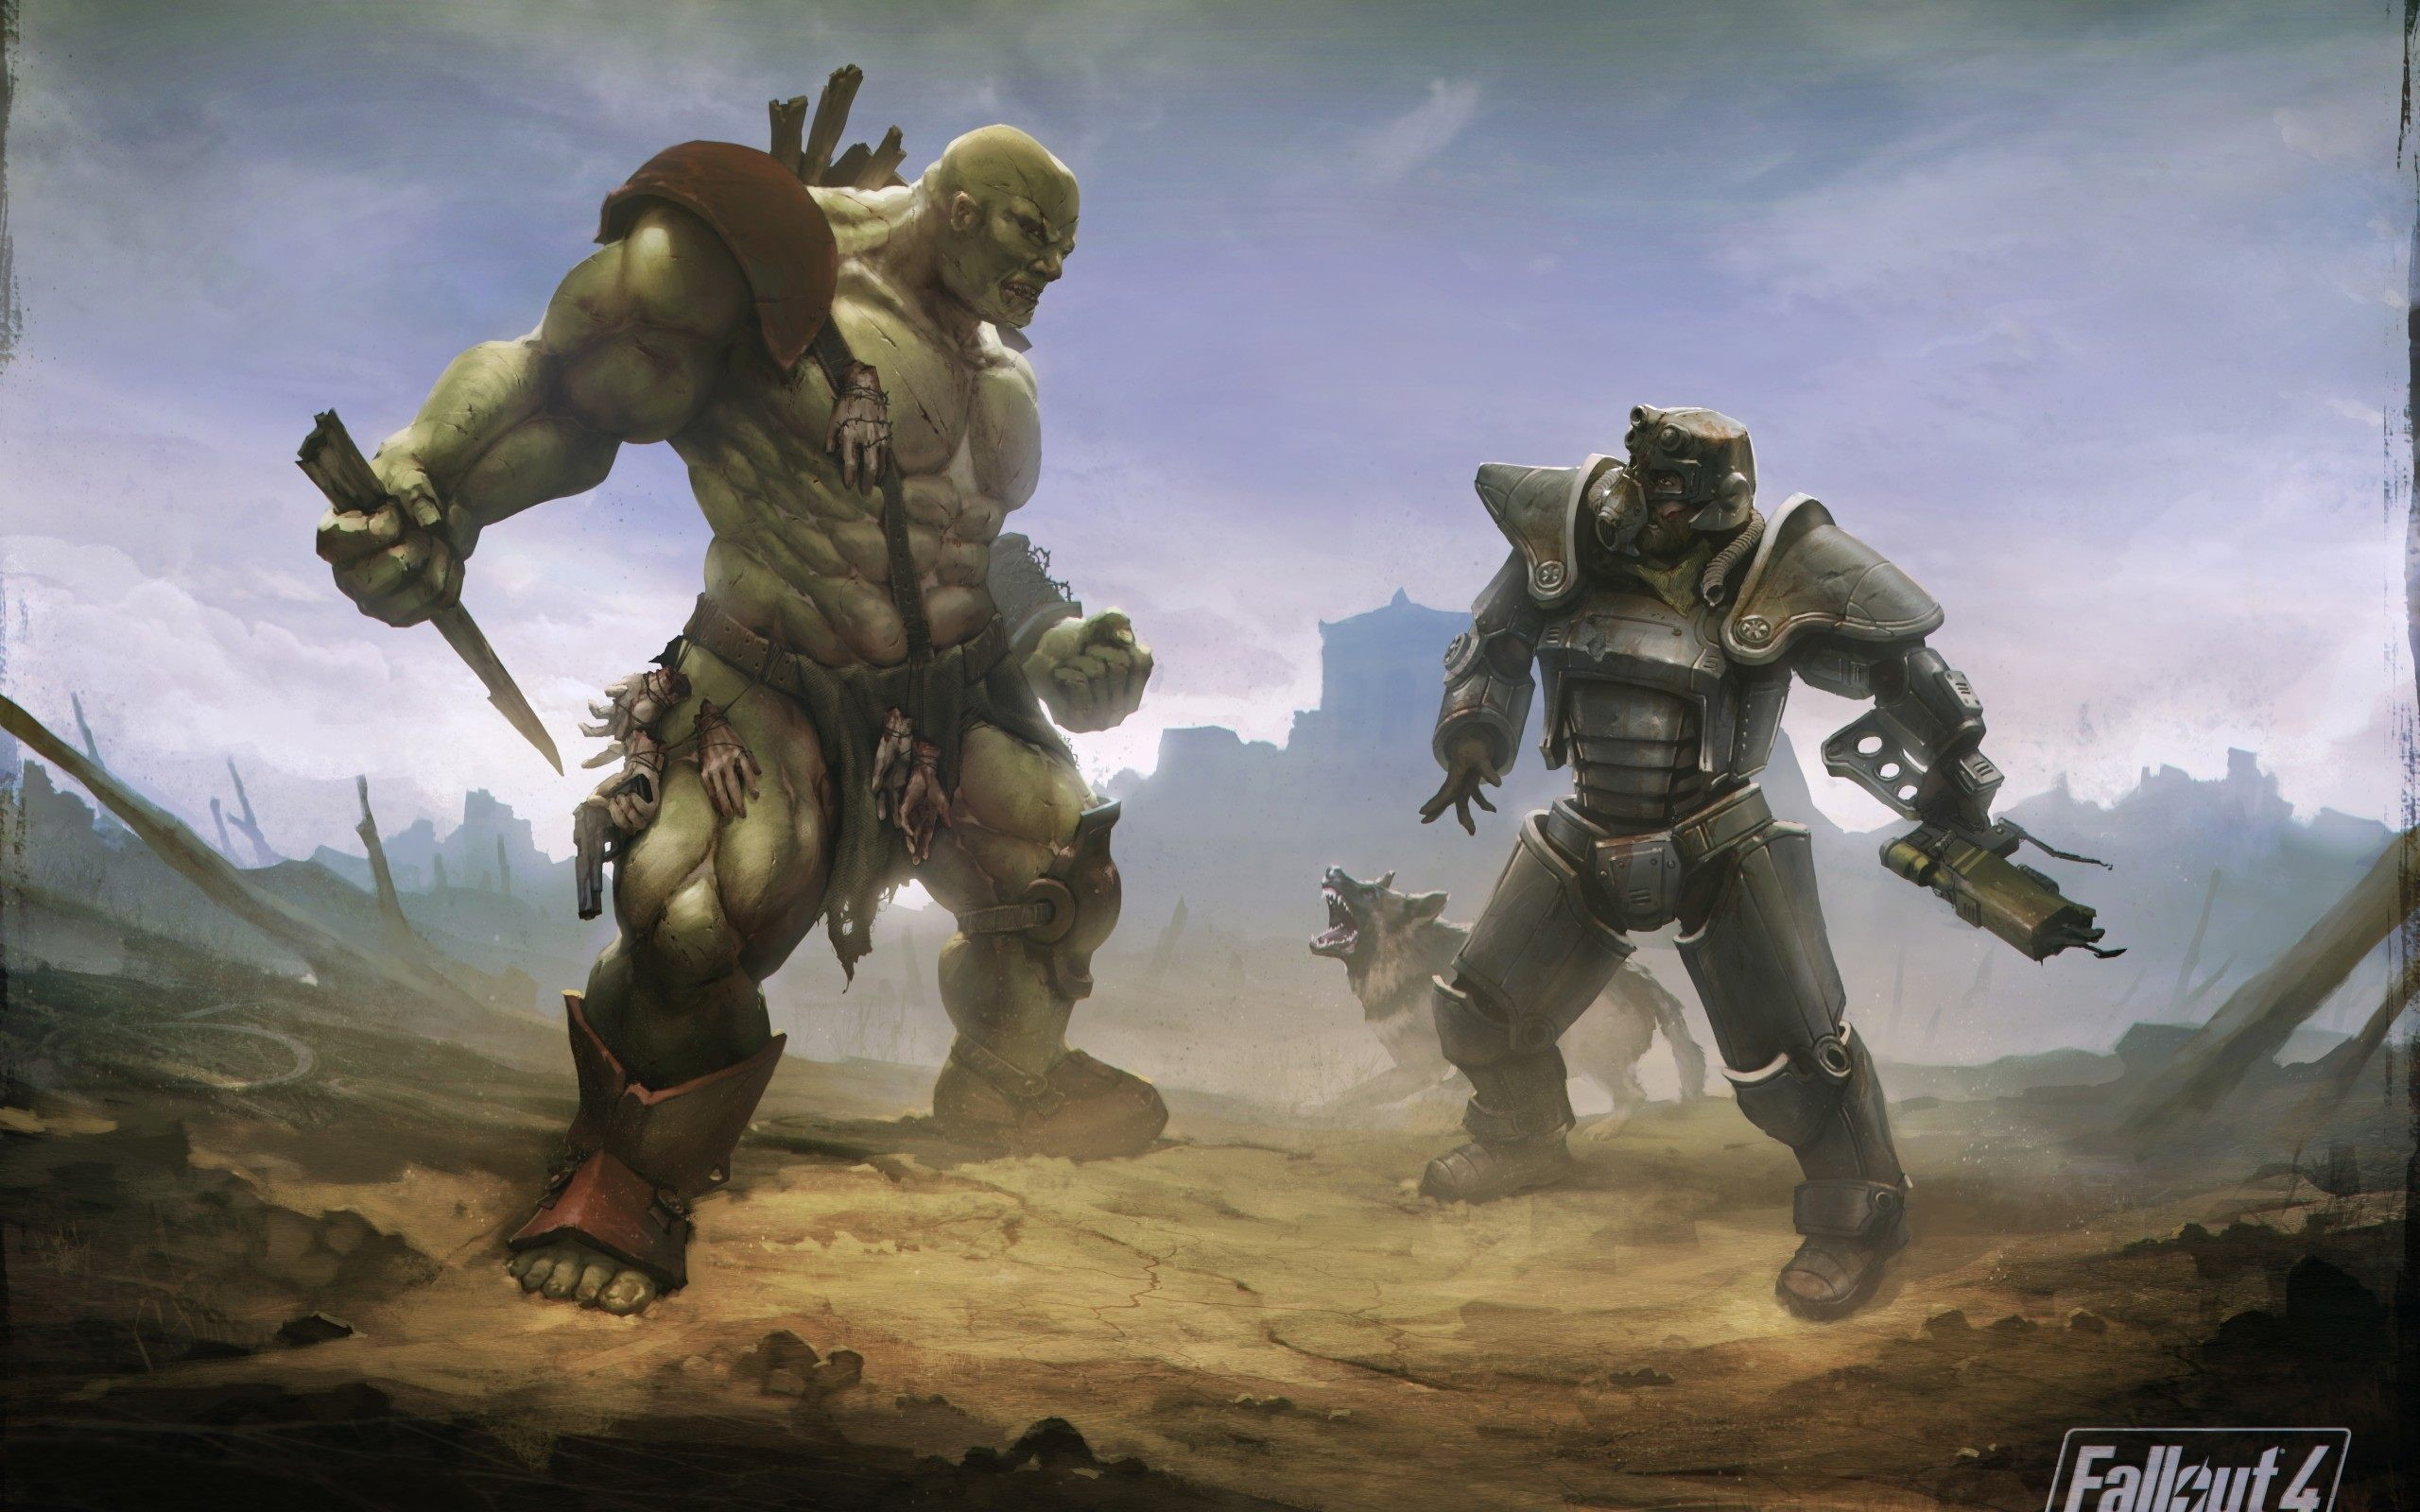 4K <b>Fallout</b> 4 <b>Wallpaper</